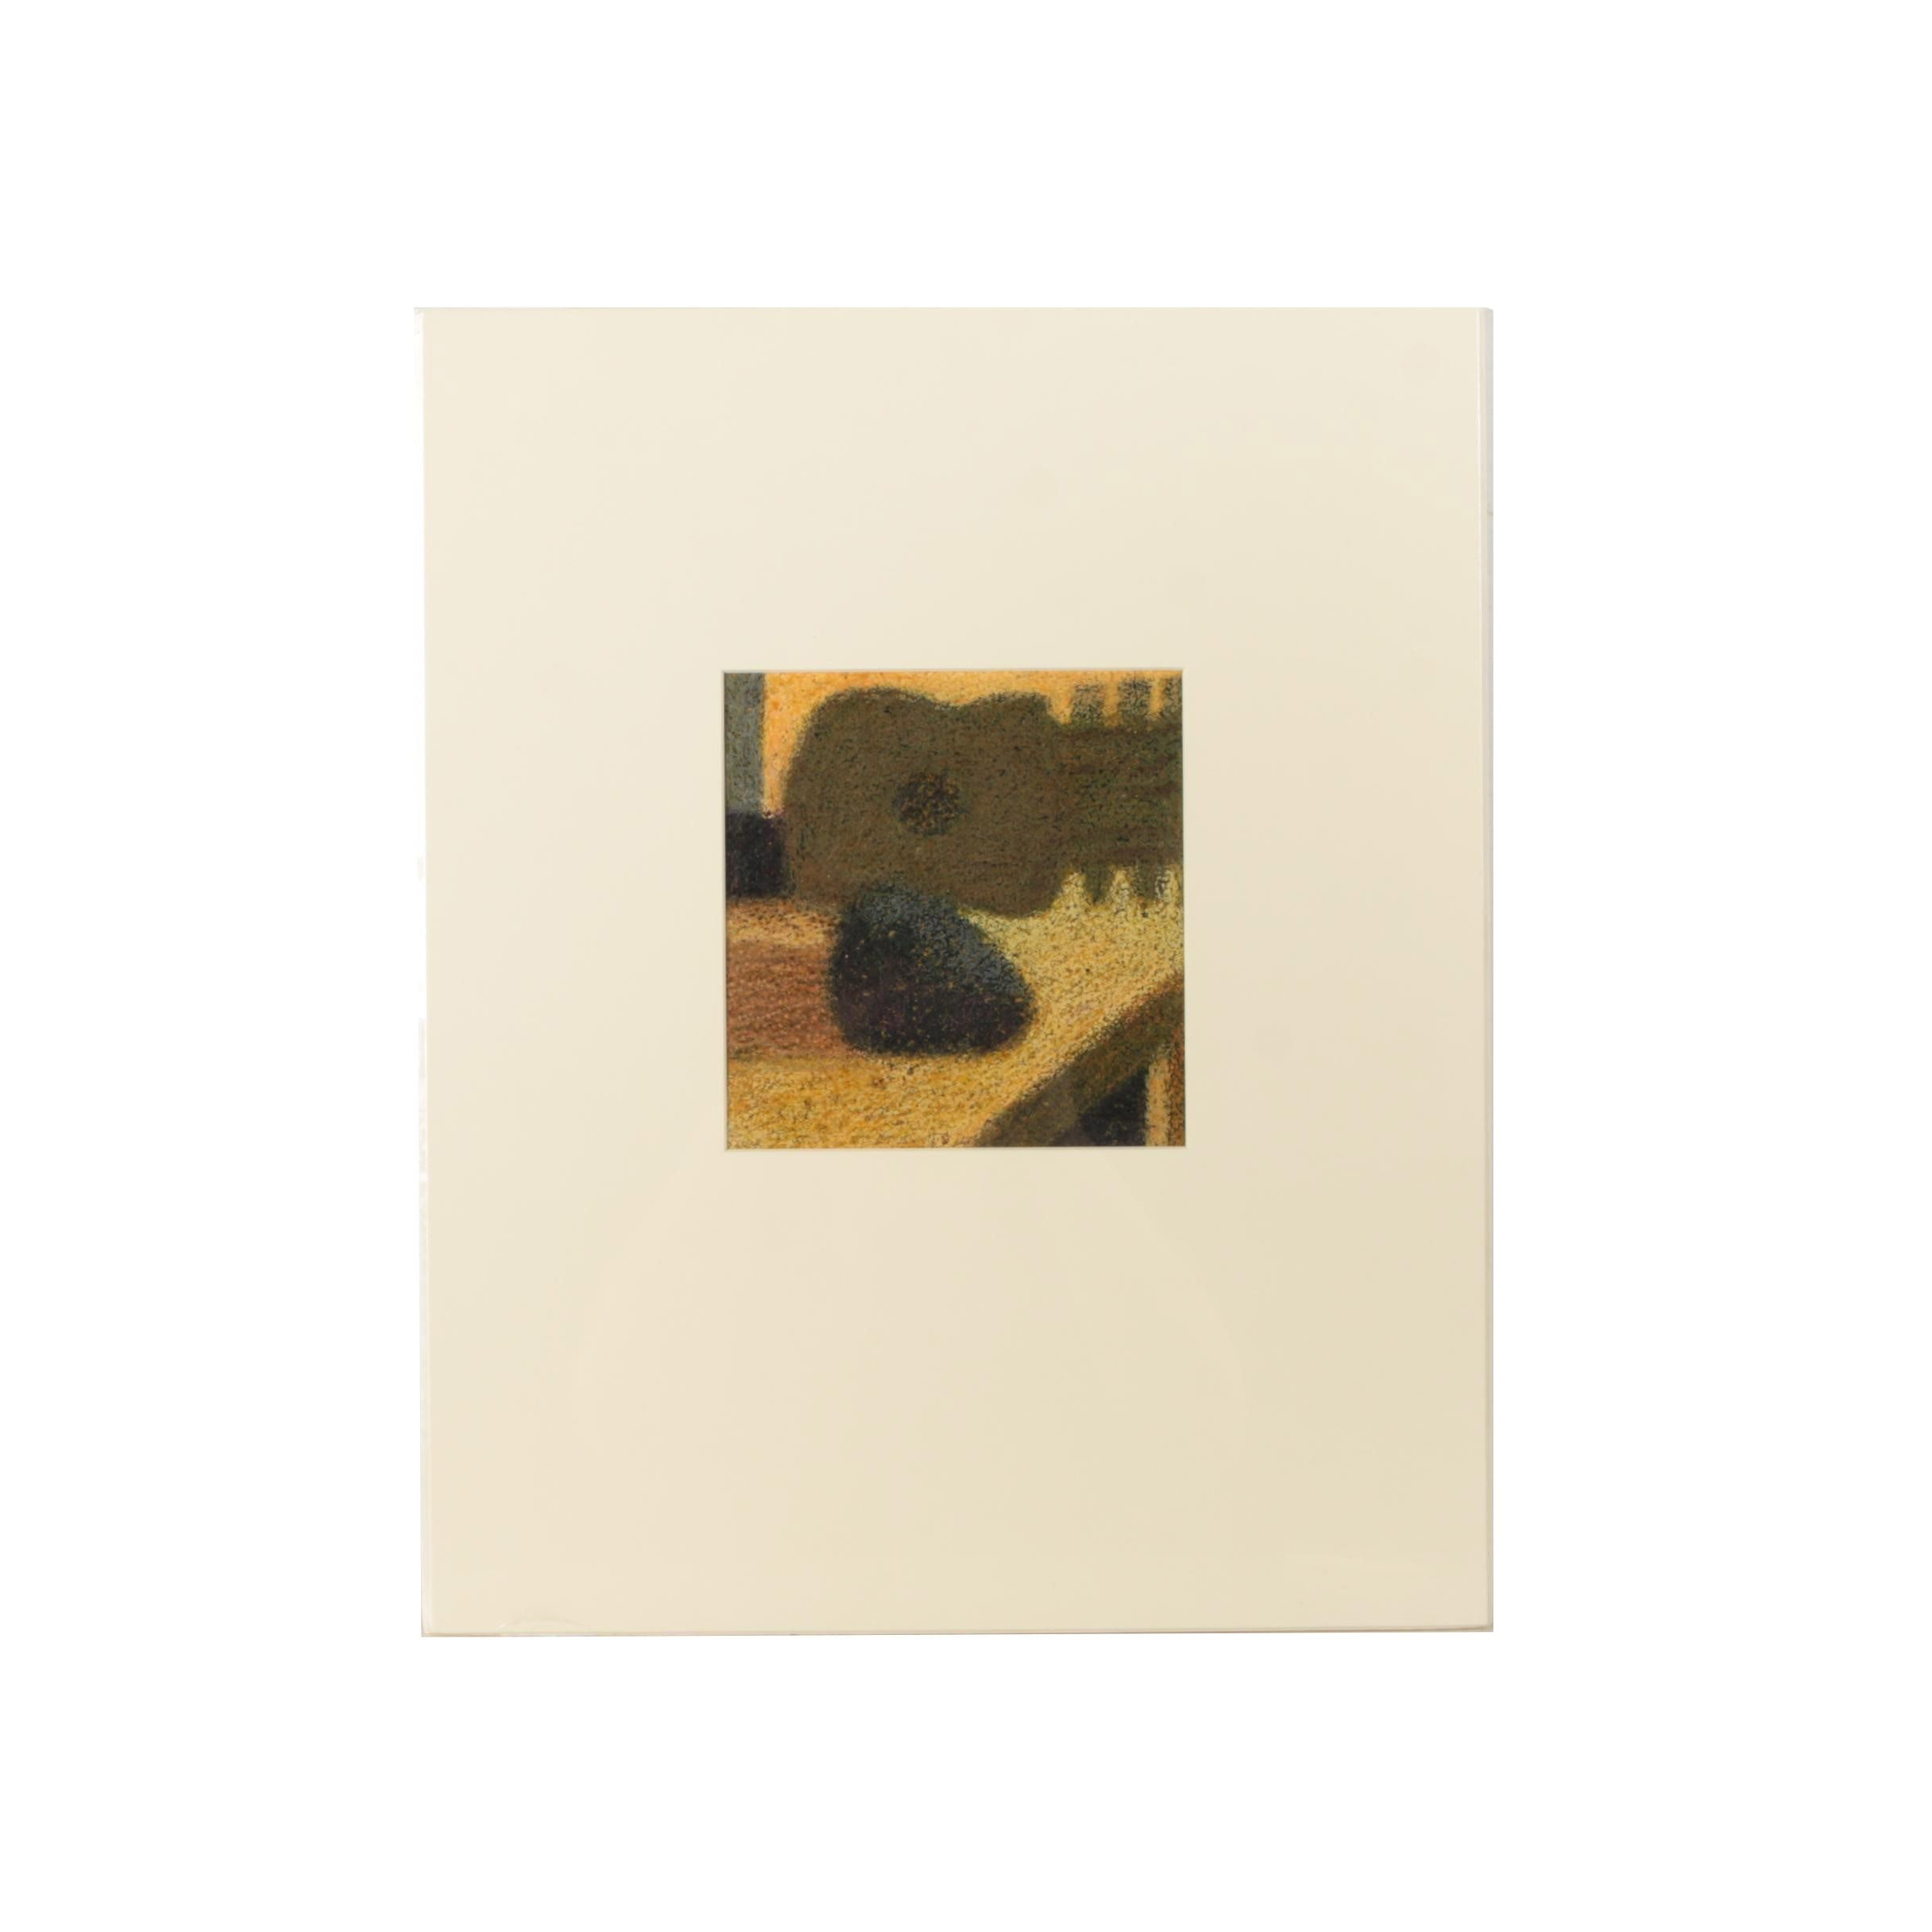 "Edgar Hatten Oil Painting on Paper ""Still Things"""